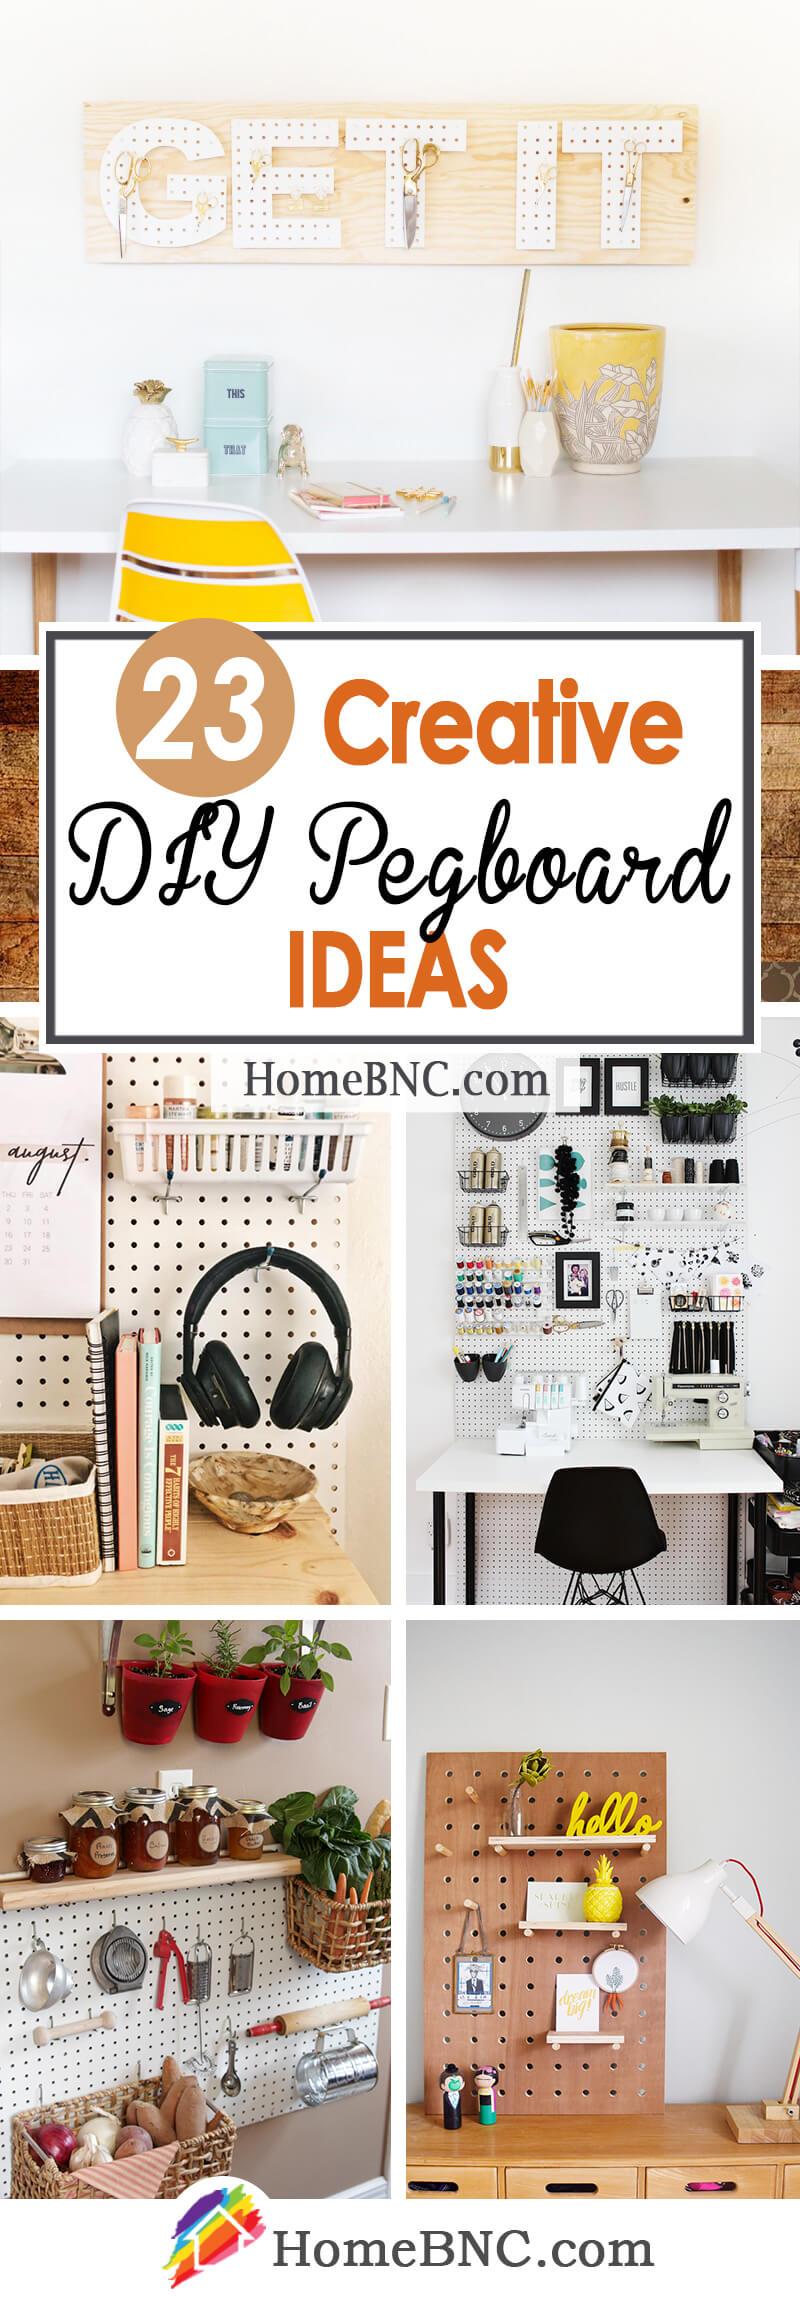 DIY Pegboard Ideas